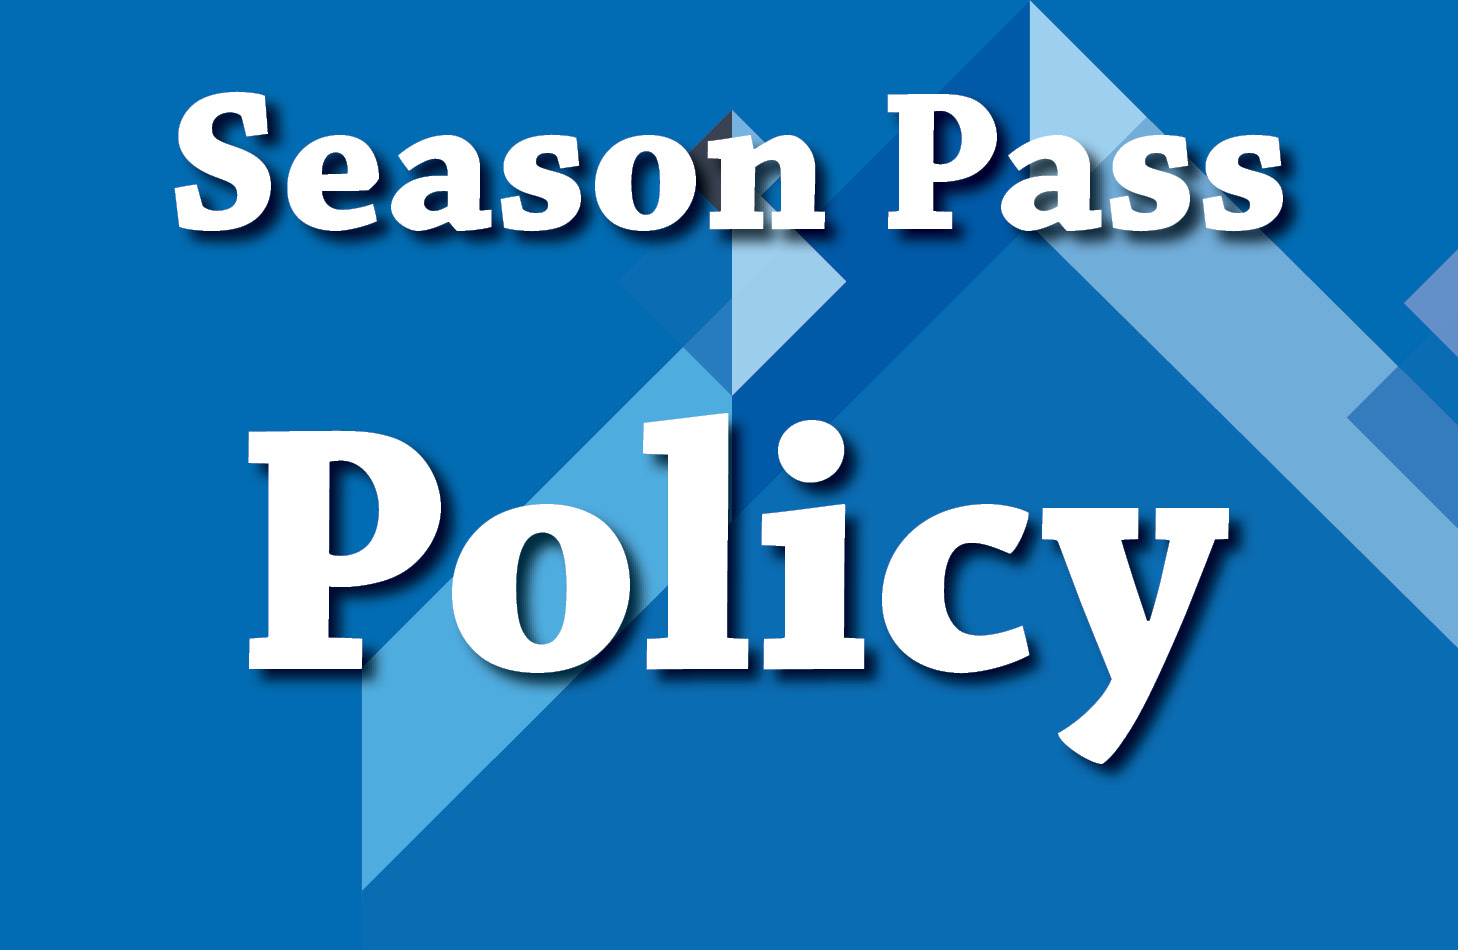 Season Pass Policy